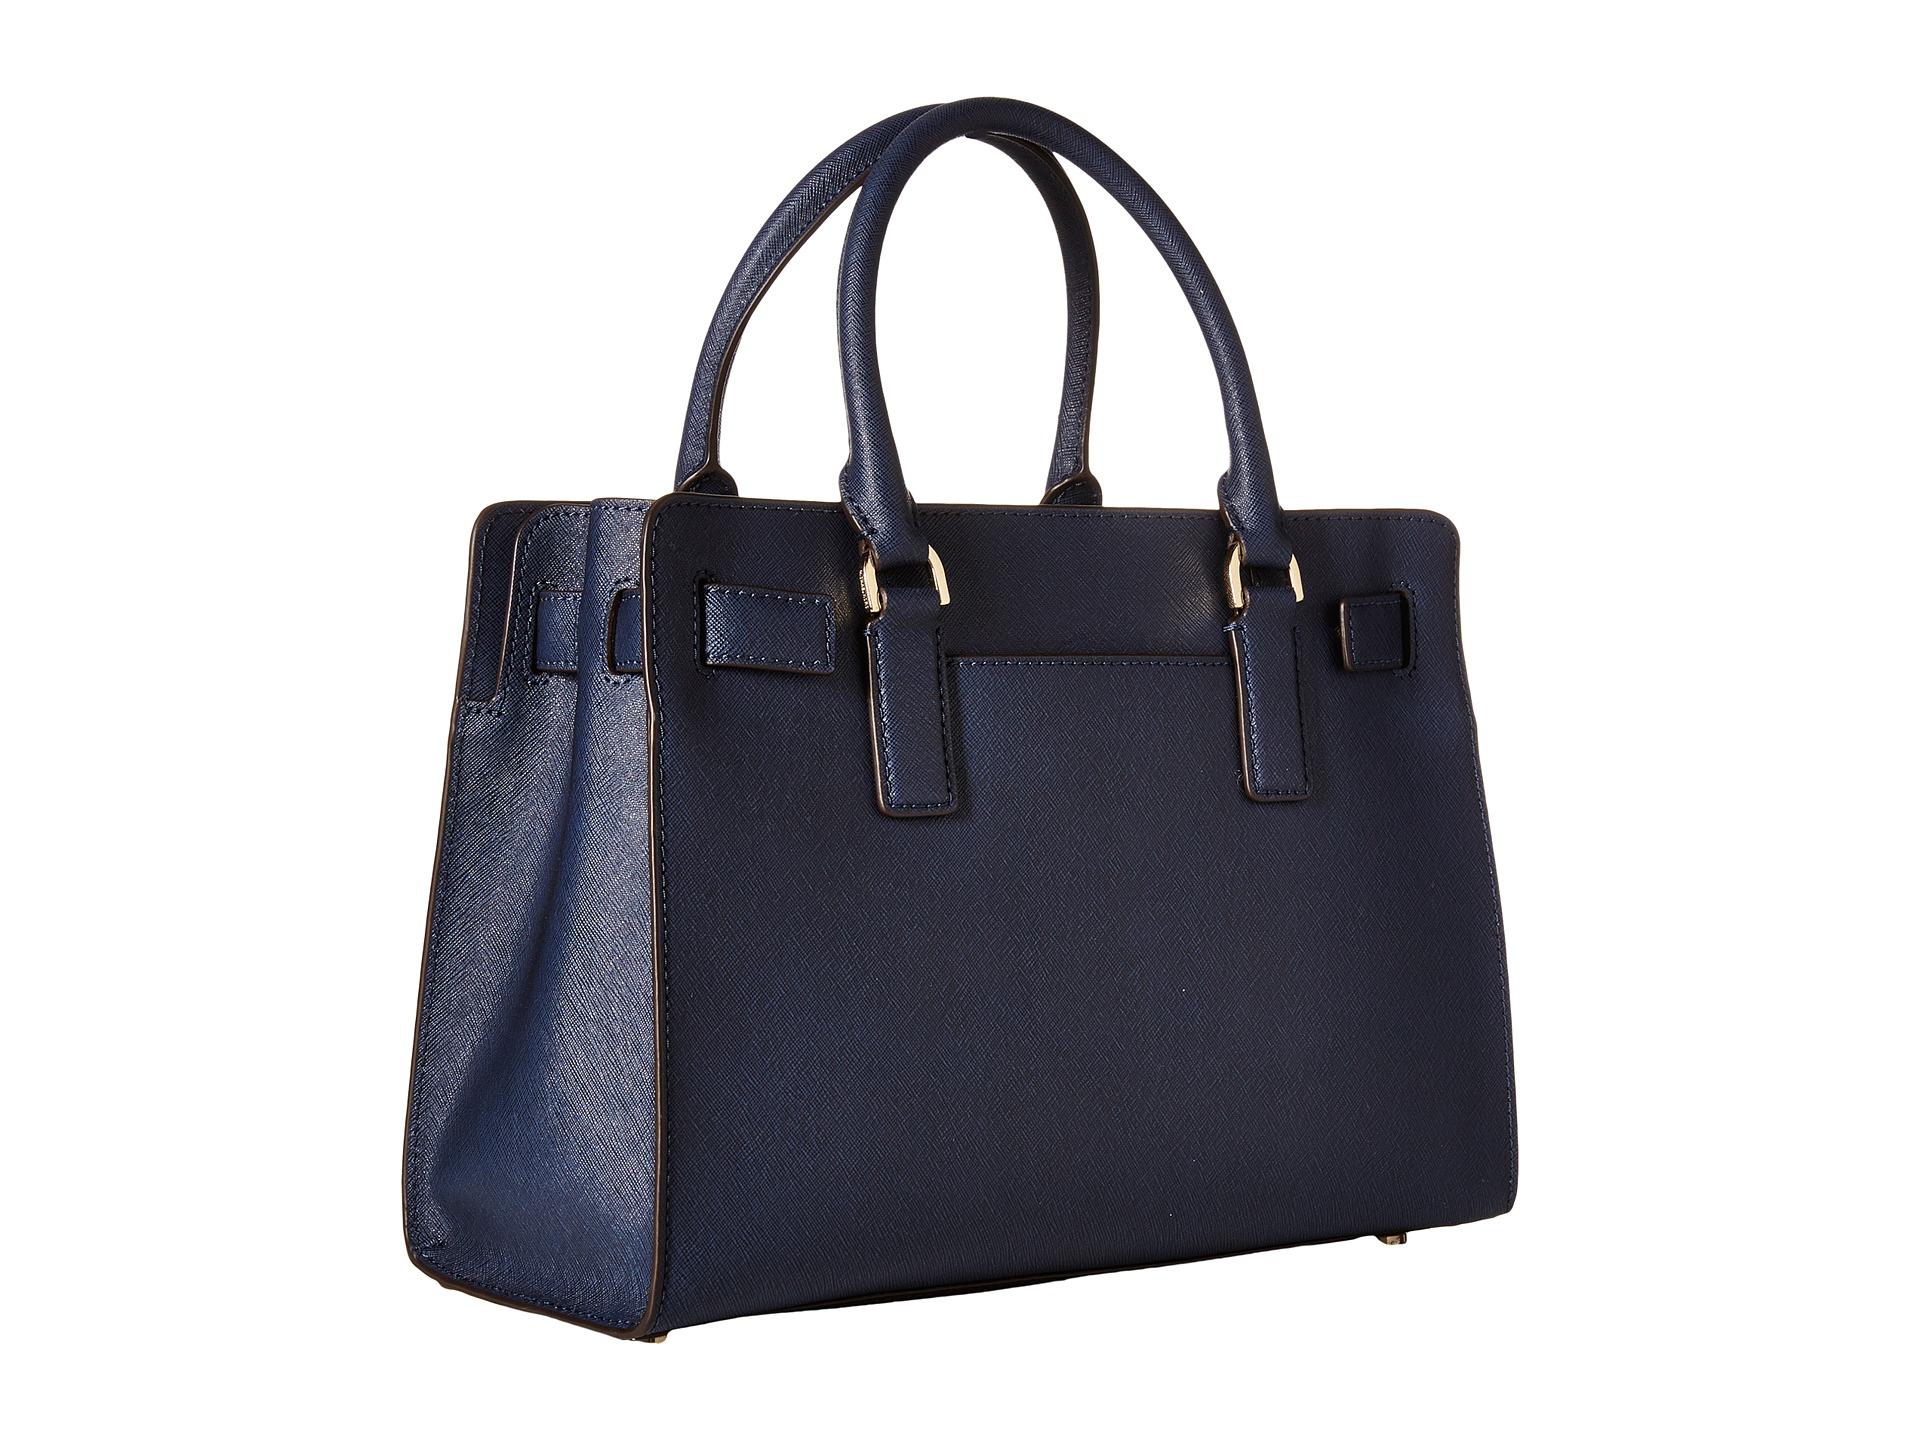 d4068a77cd1f ... discount code for lyst michael michael kors dillon top zip east west  satchel in blue b6899